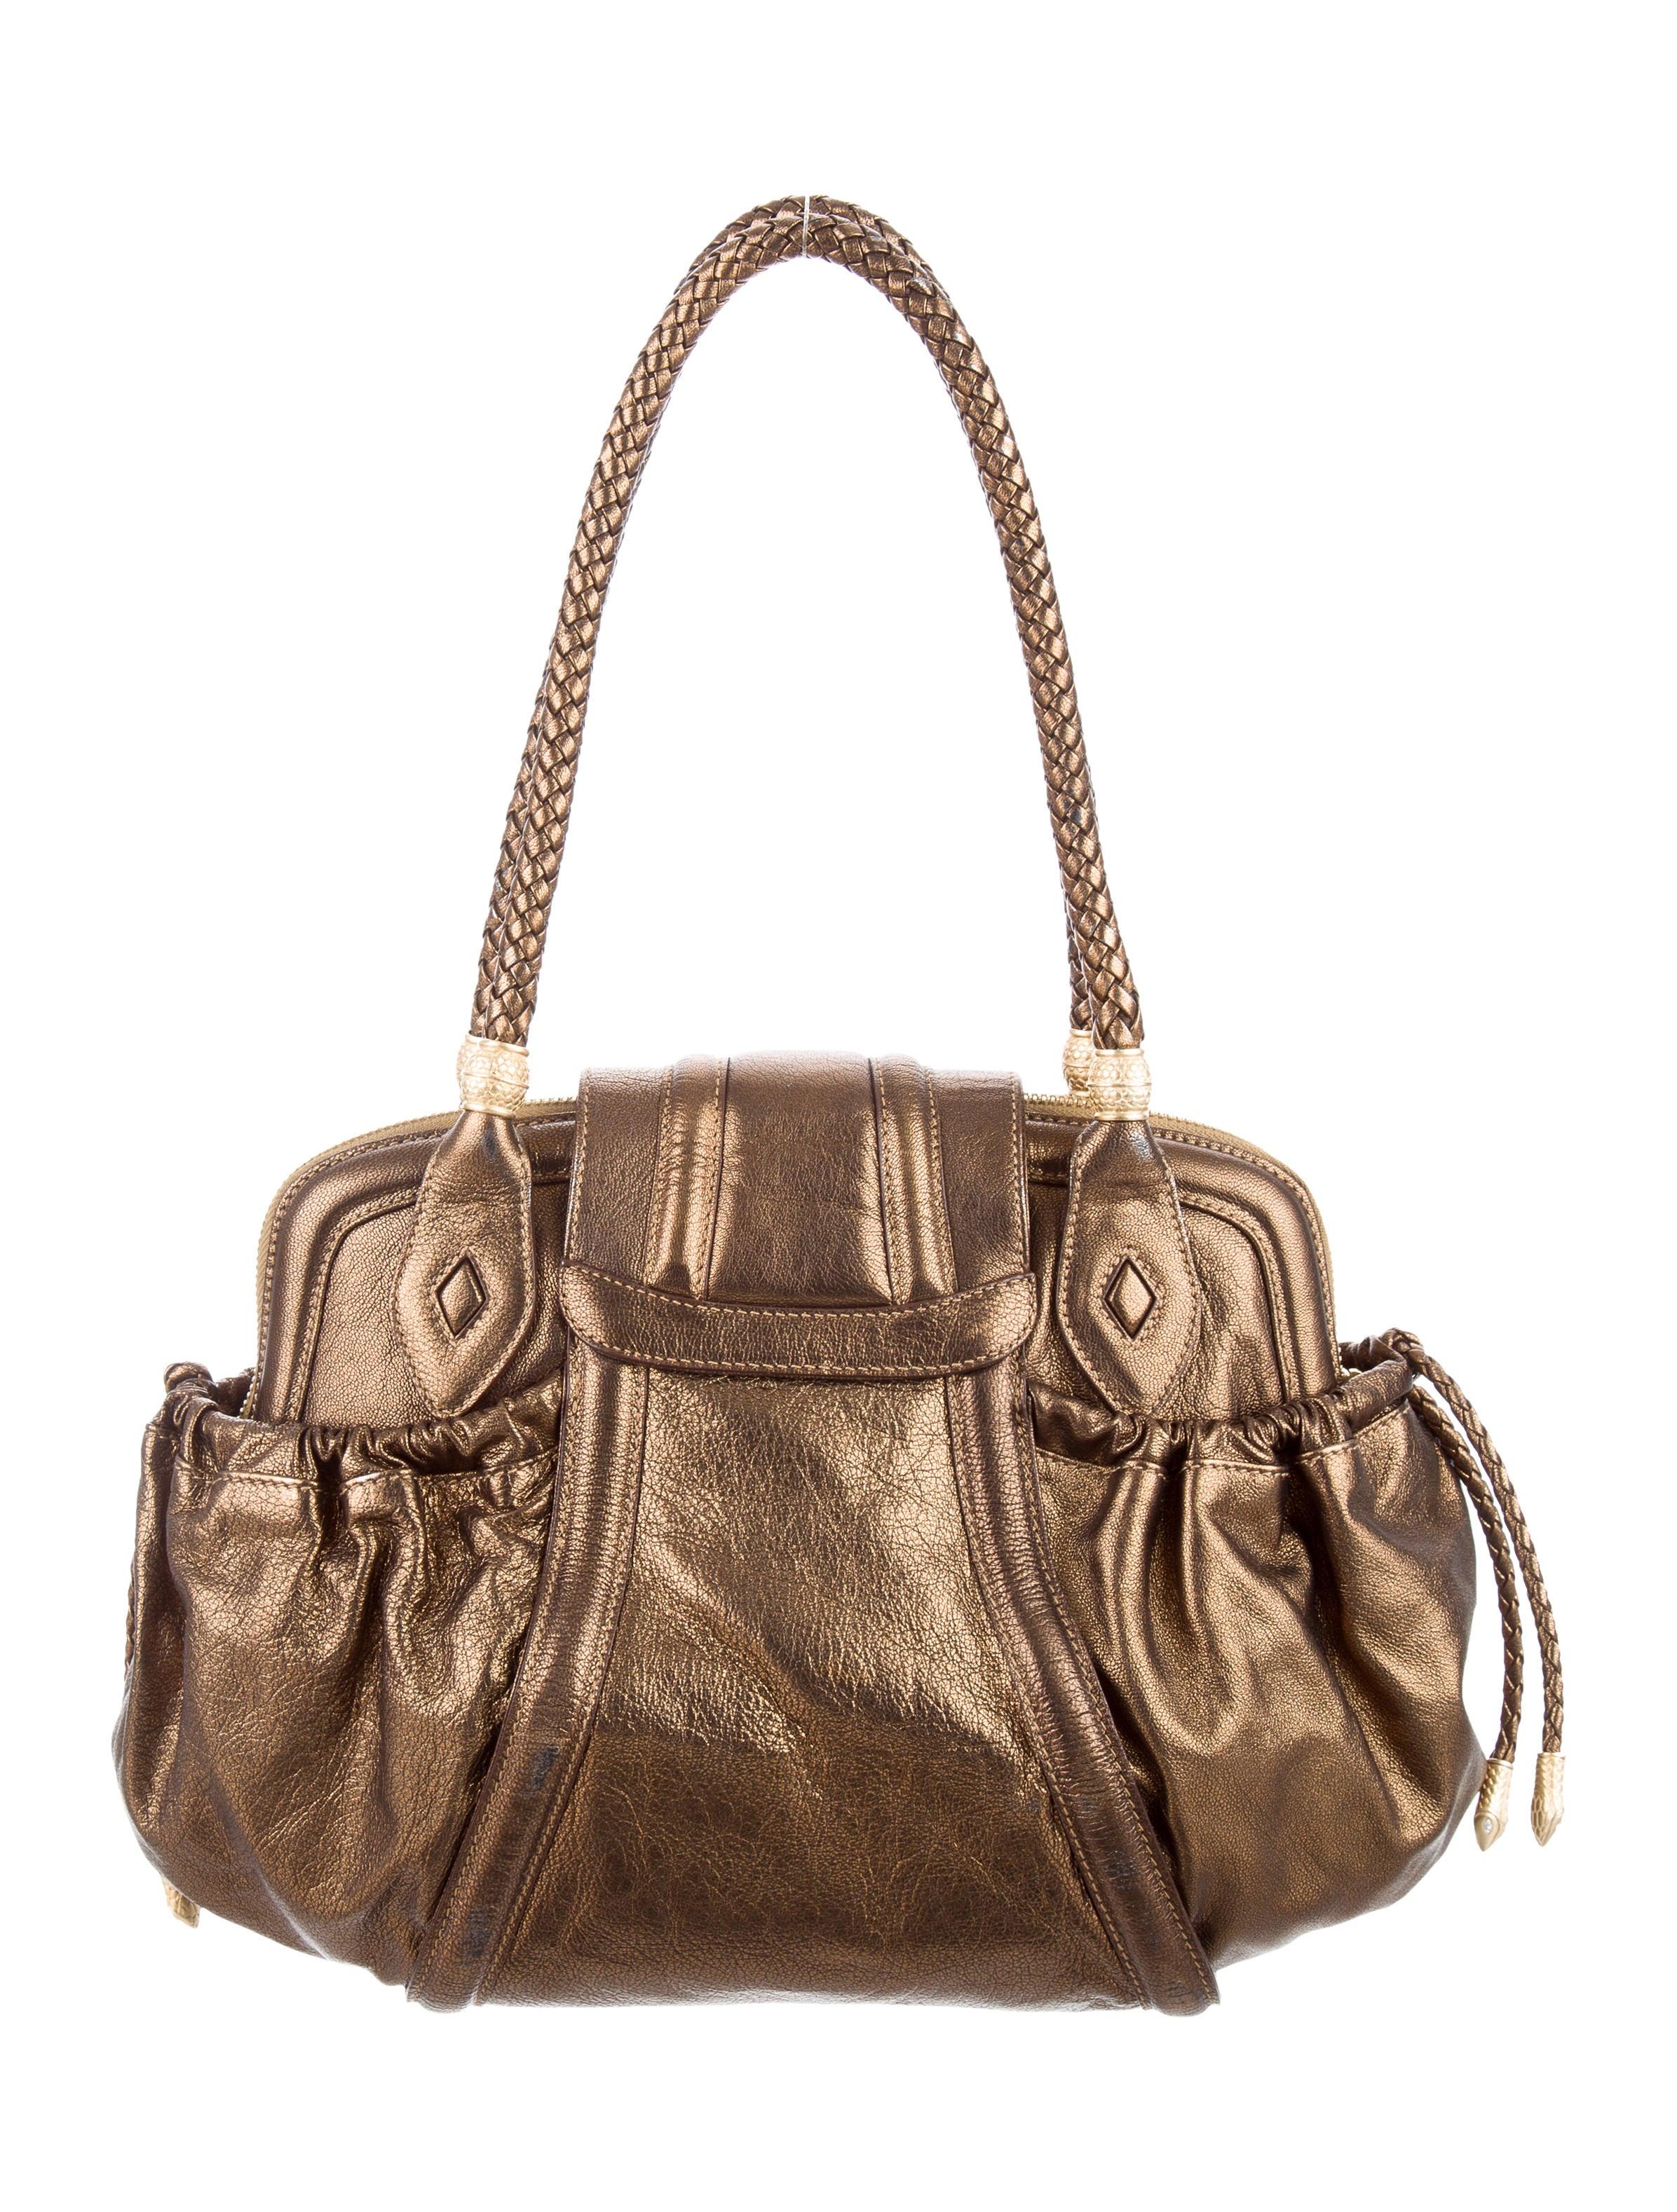 Judith Leiber Metallic Shoulder Bag - Handbags